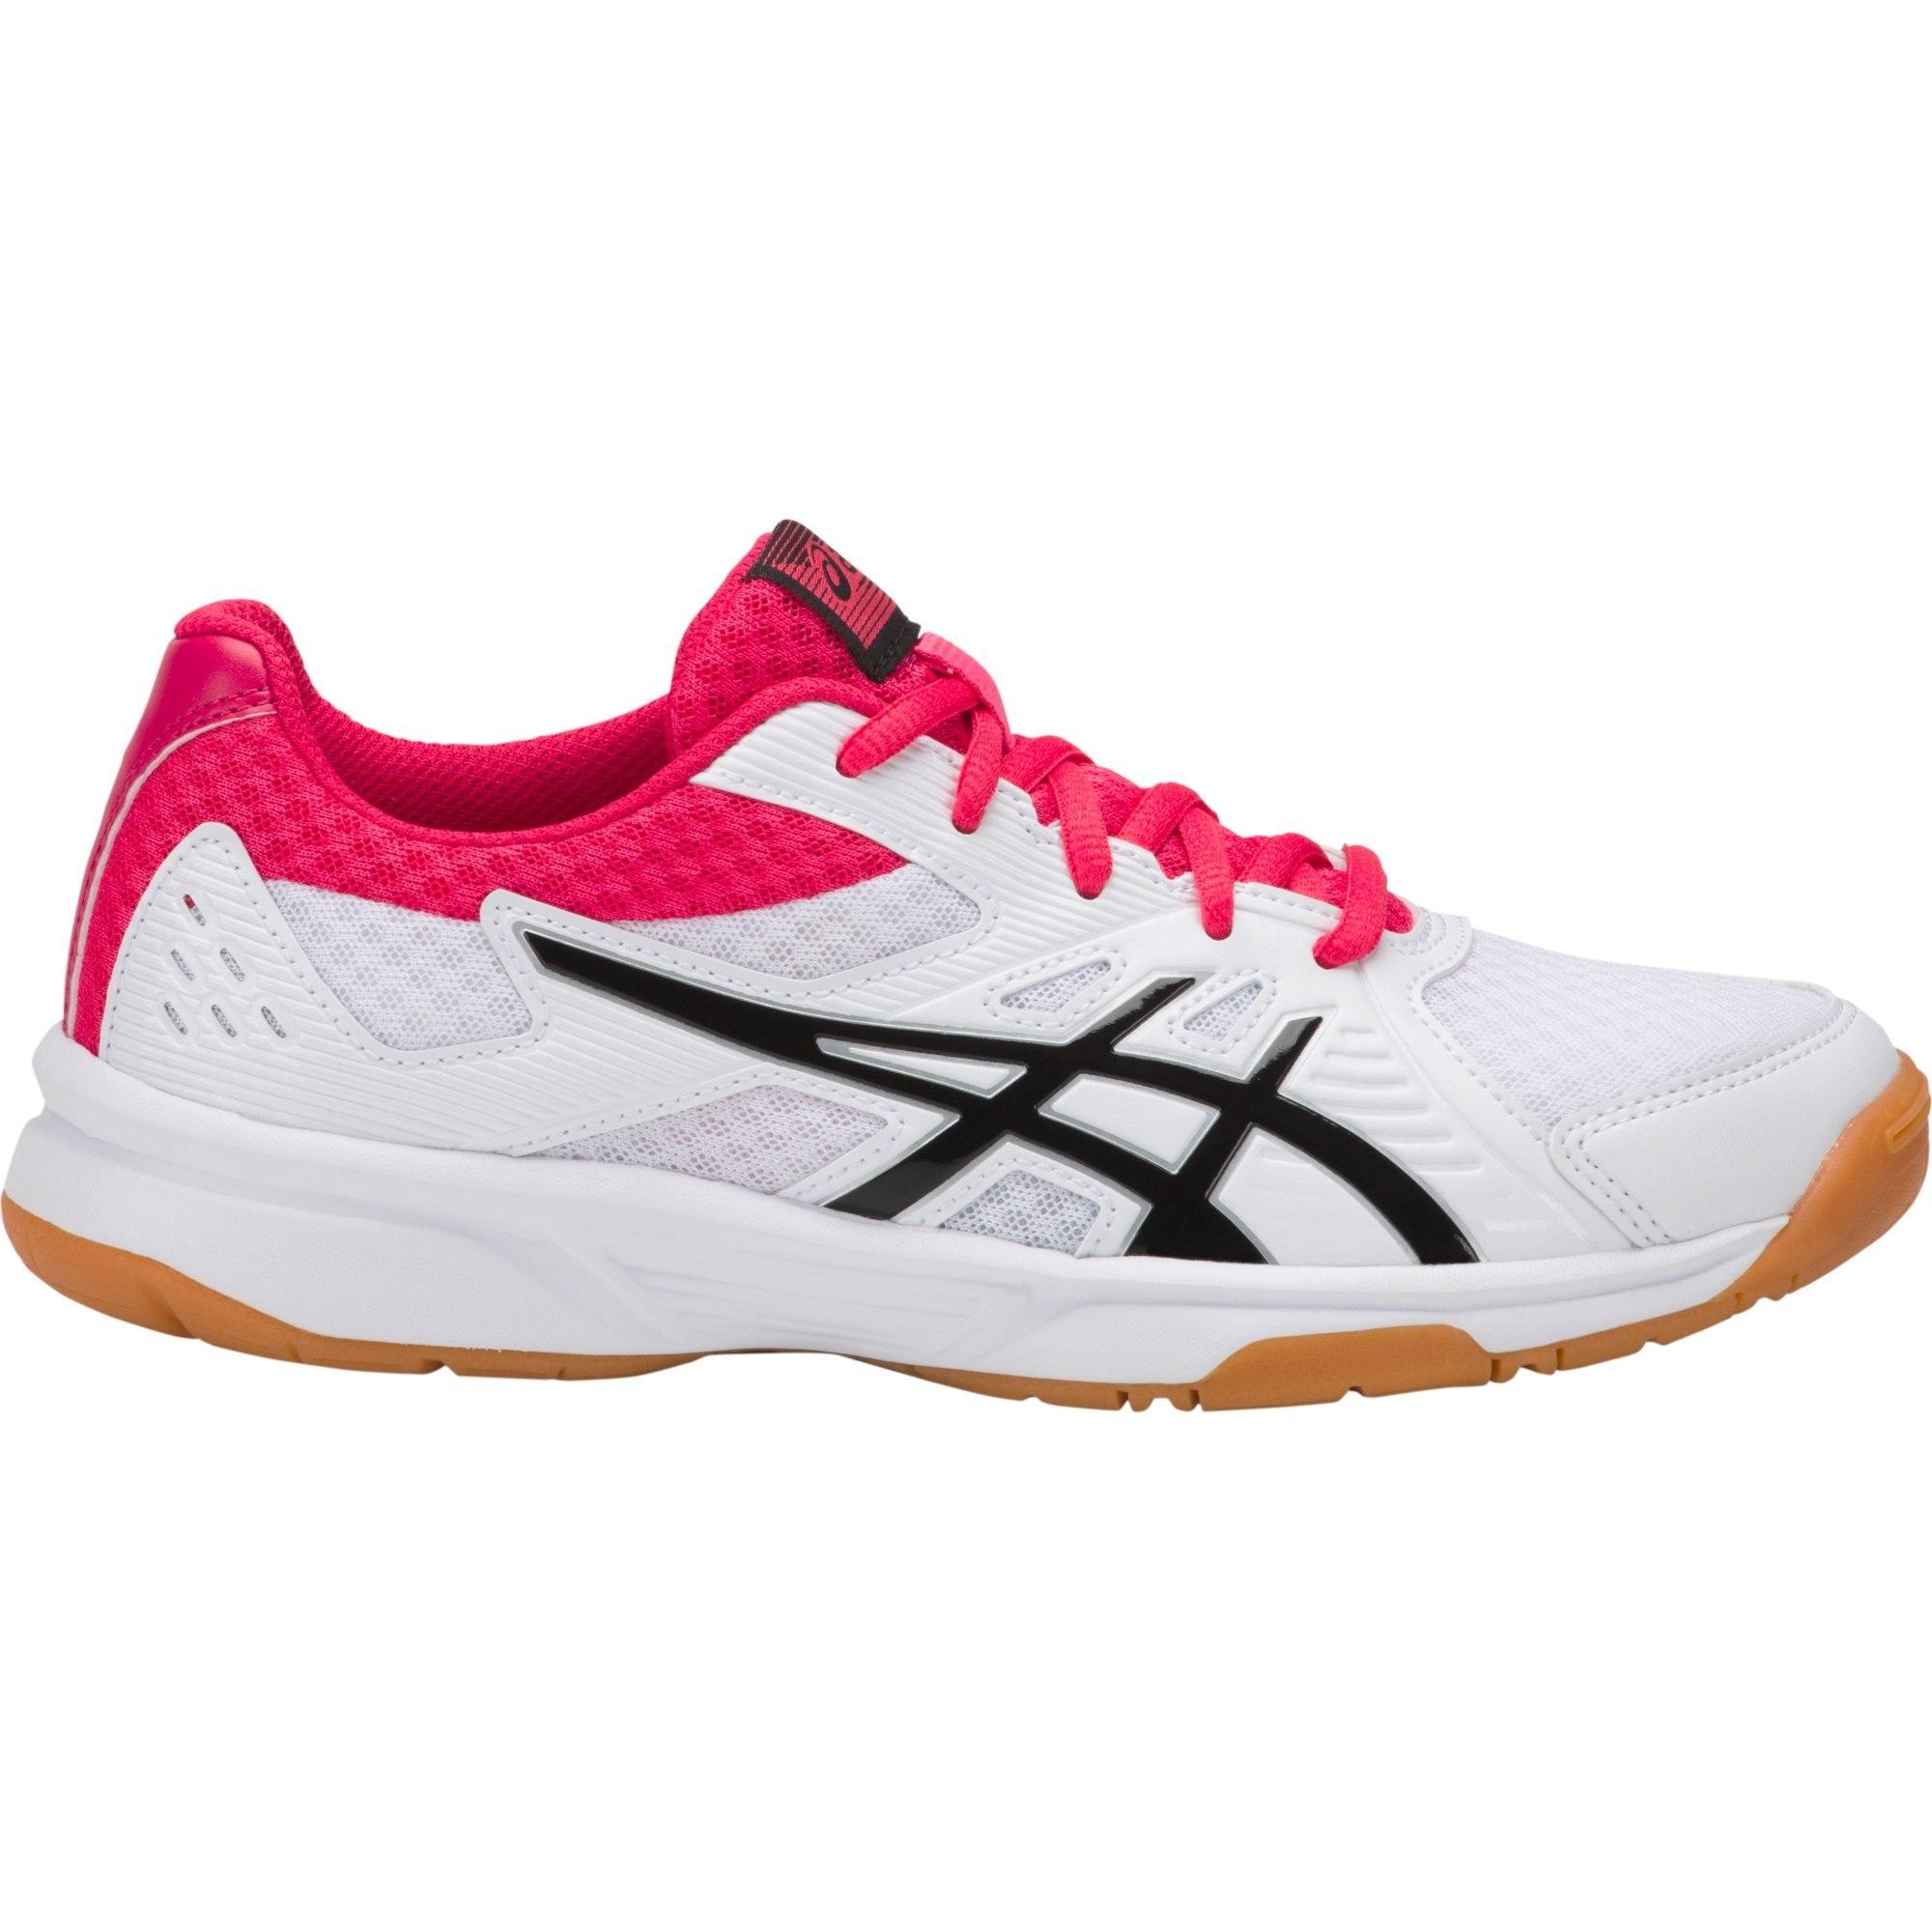 Asics Womens Upcourt 3 Indoor Court Shoes WhitePixel Pink